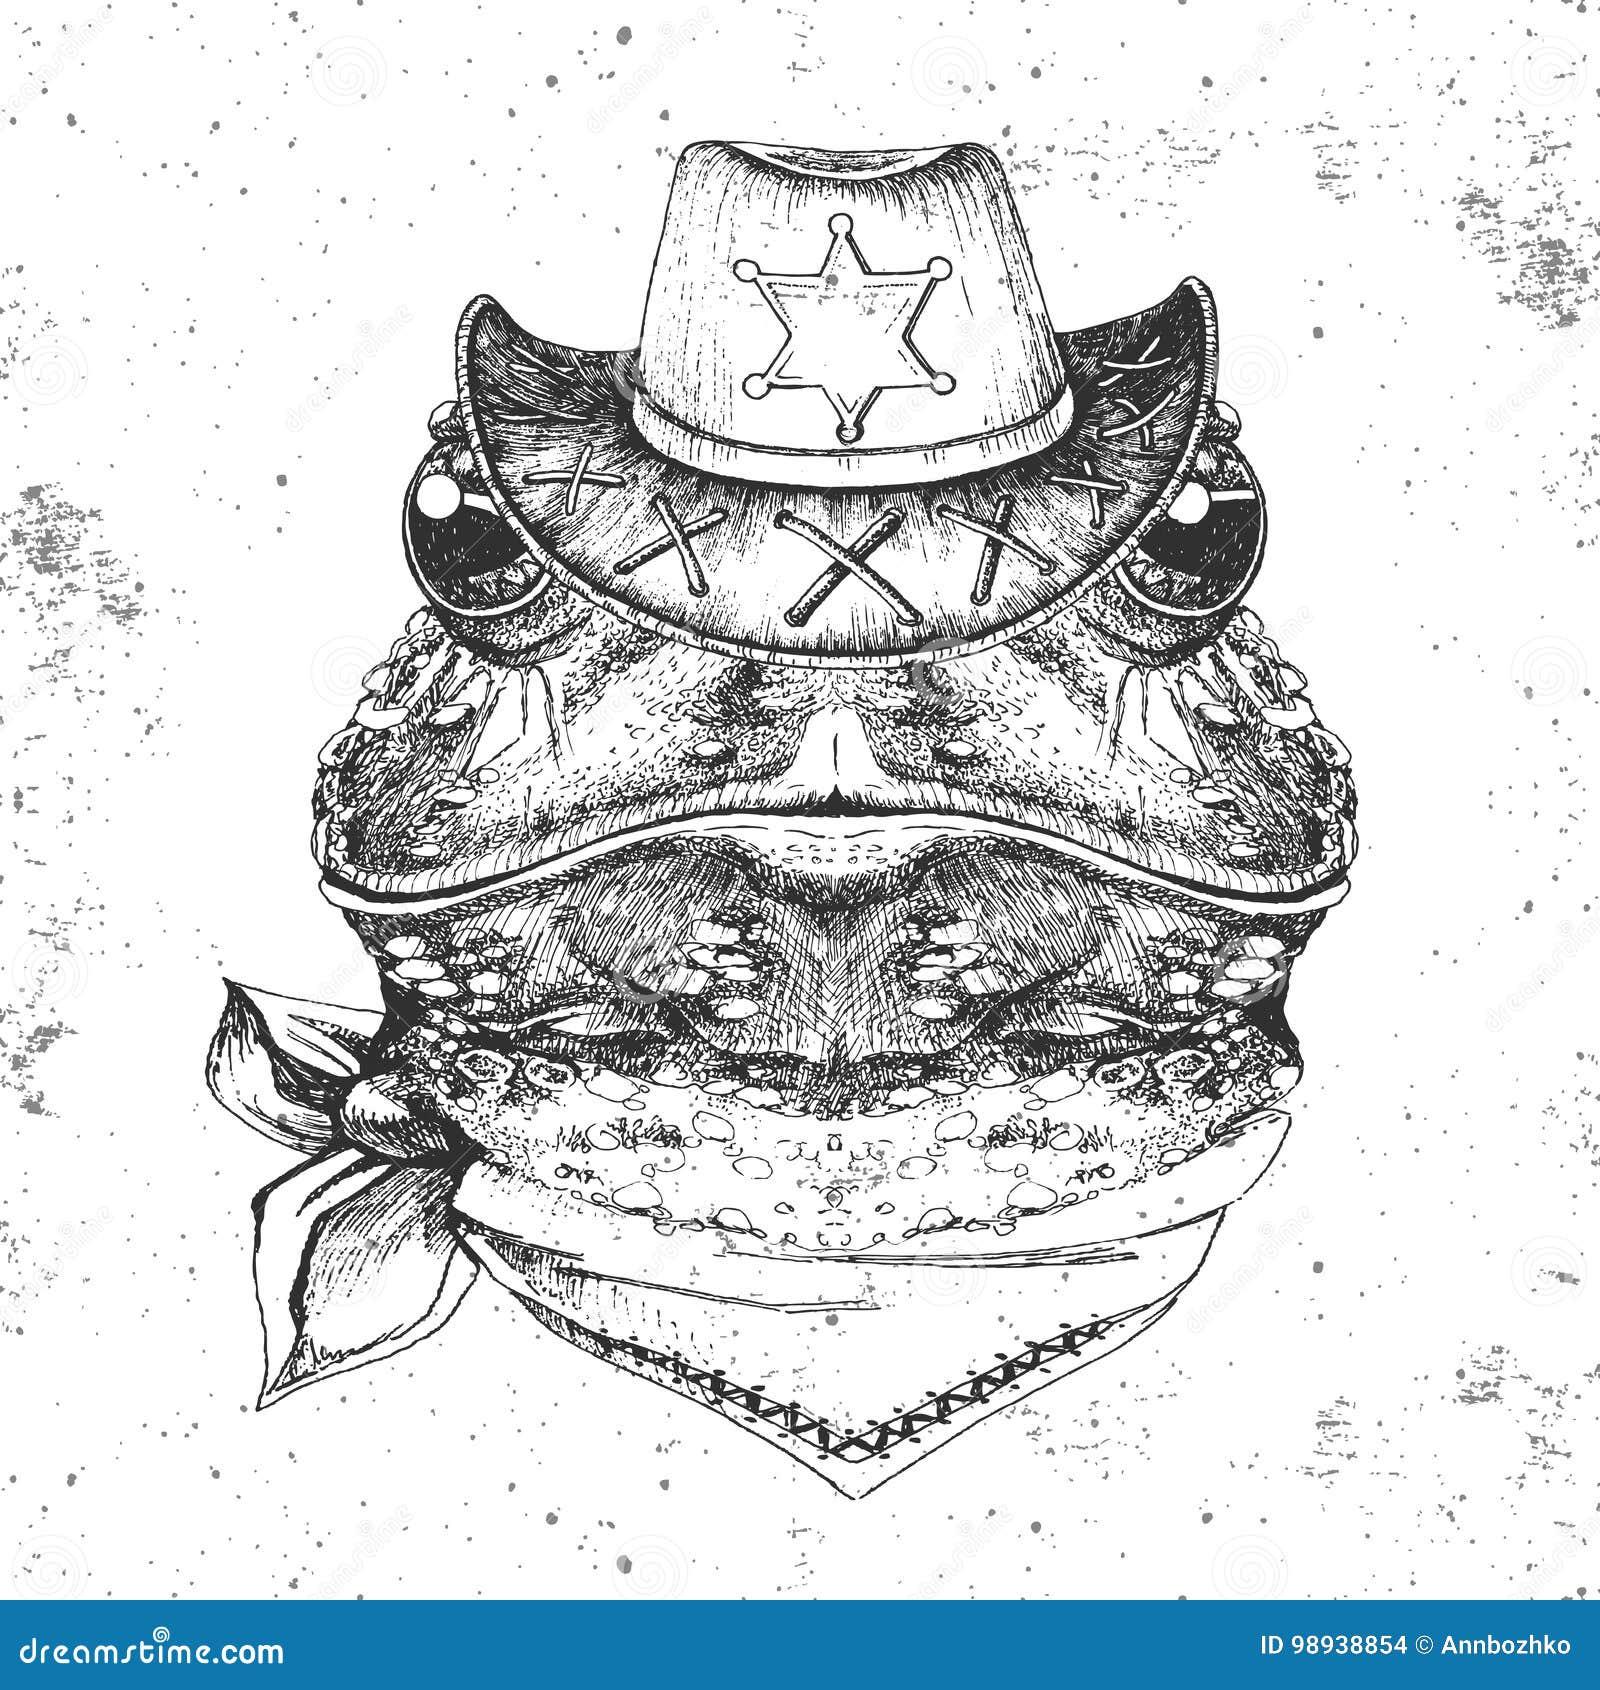 9e2841818390a Rana del animal del inconformista Bozal del dibujo de la mano de la rana